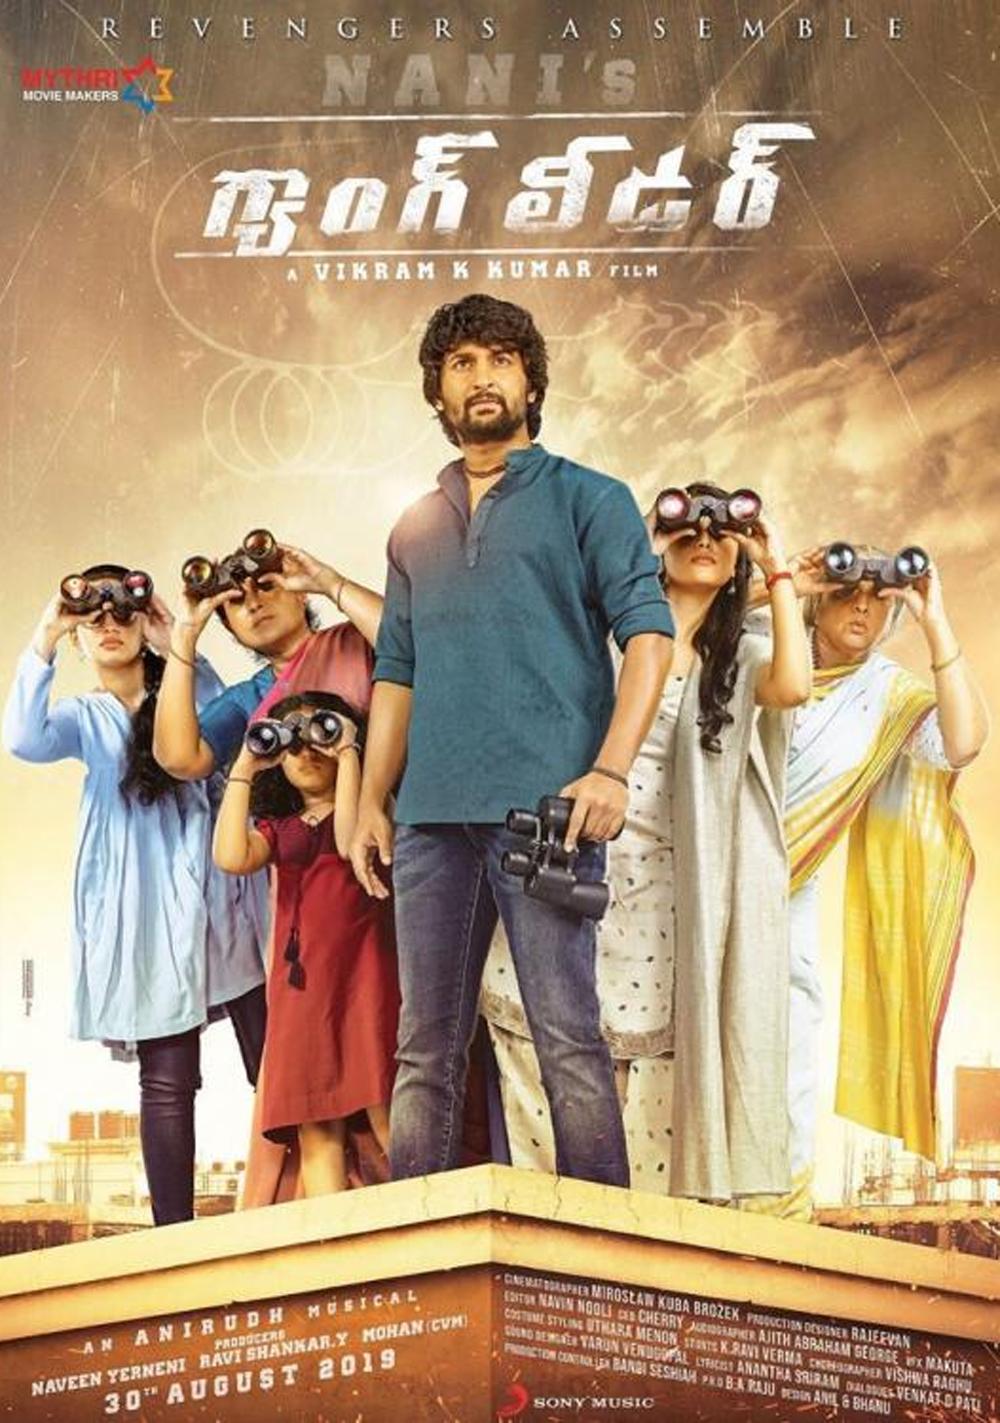 Nani Gang Leader Movie Release Date Problem - Telugu Tollywood Movie Cinema Film Latest News Nani Gang Leader Movie Release Date Problem -